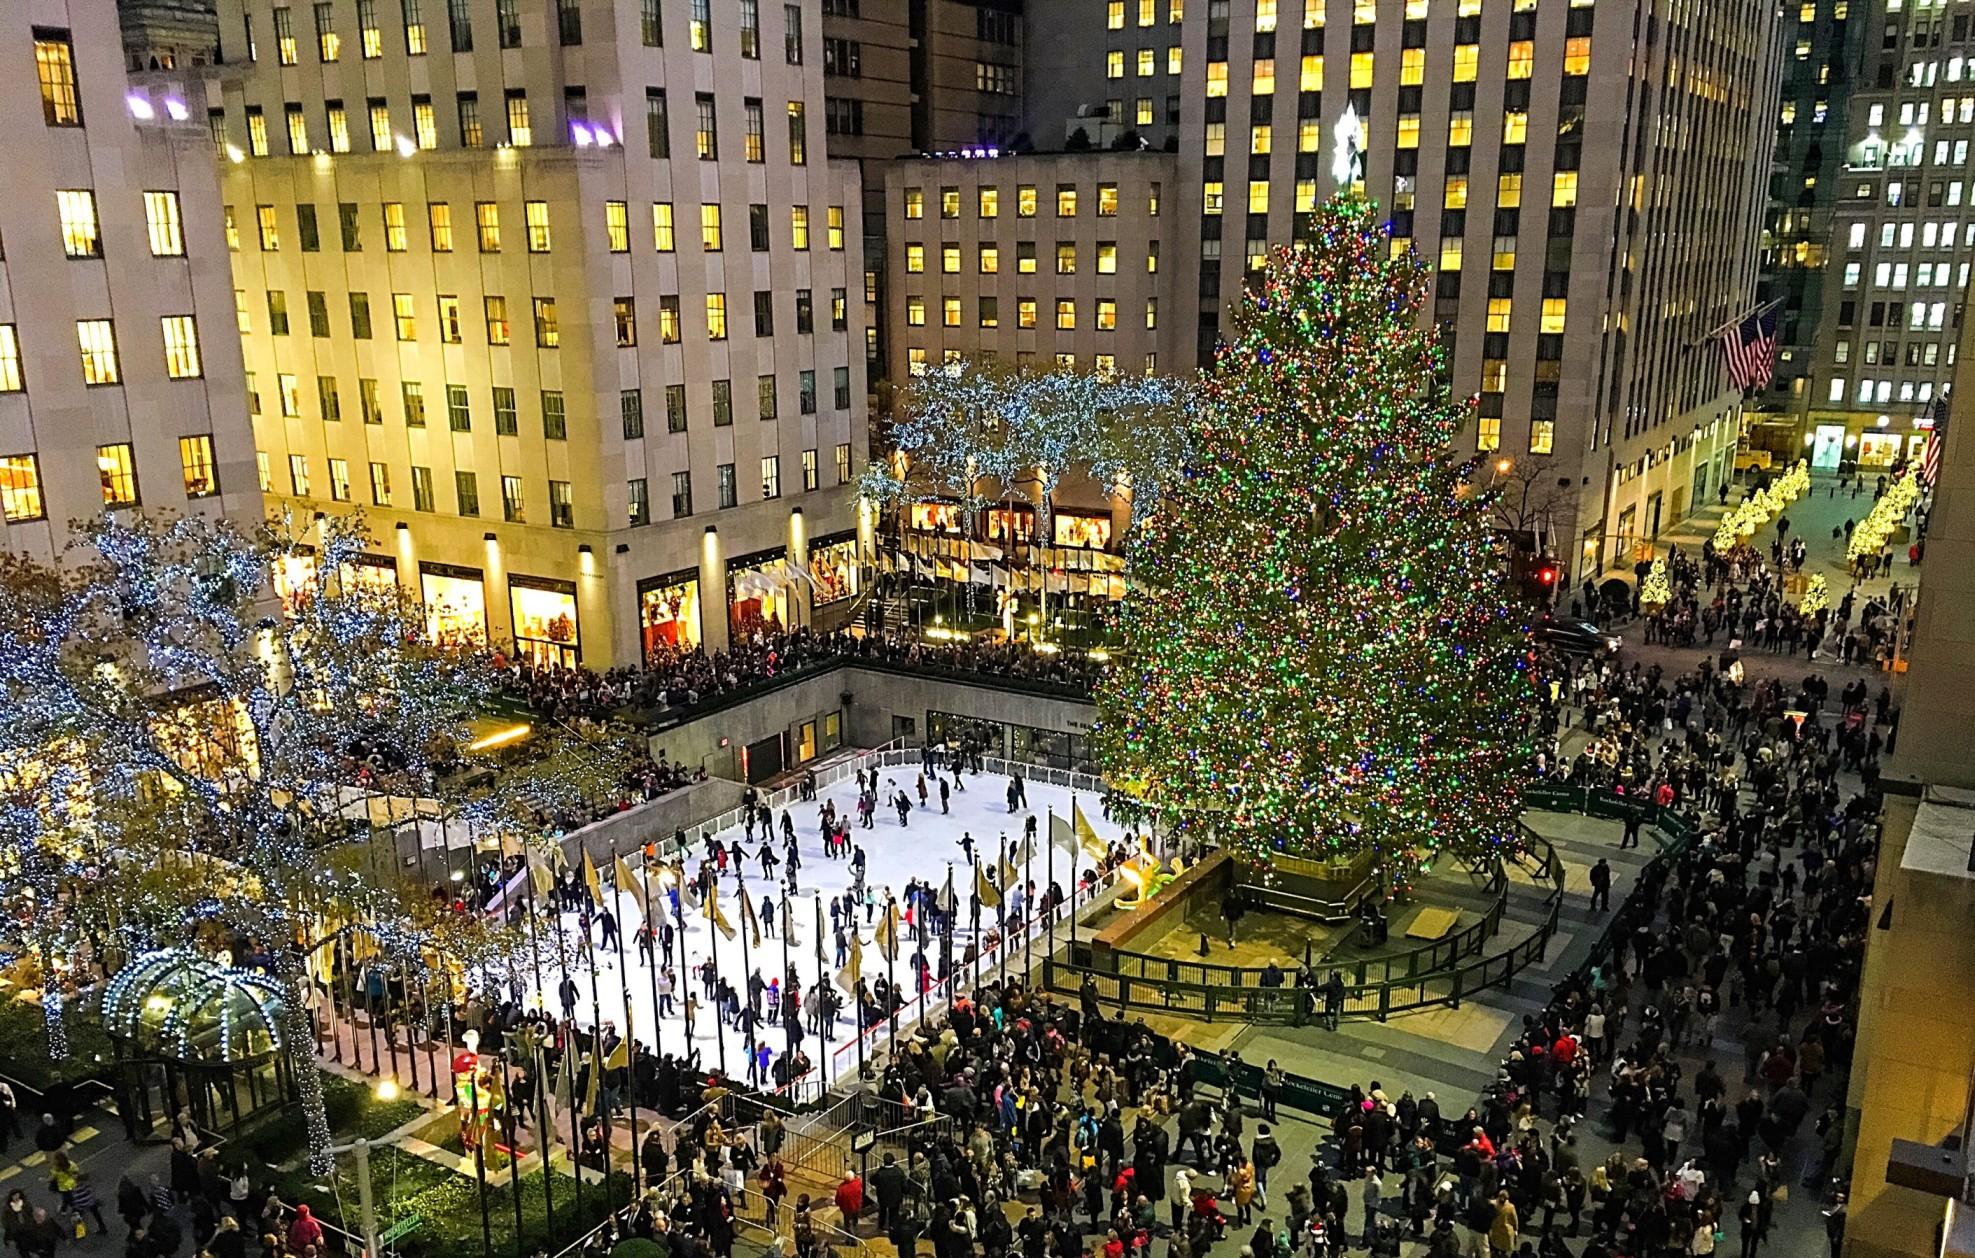 Rockefeller Center Plaza with Christmas Tree